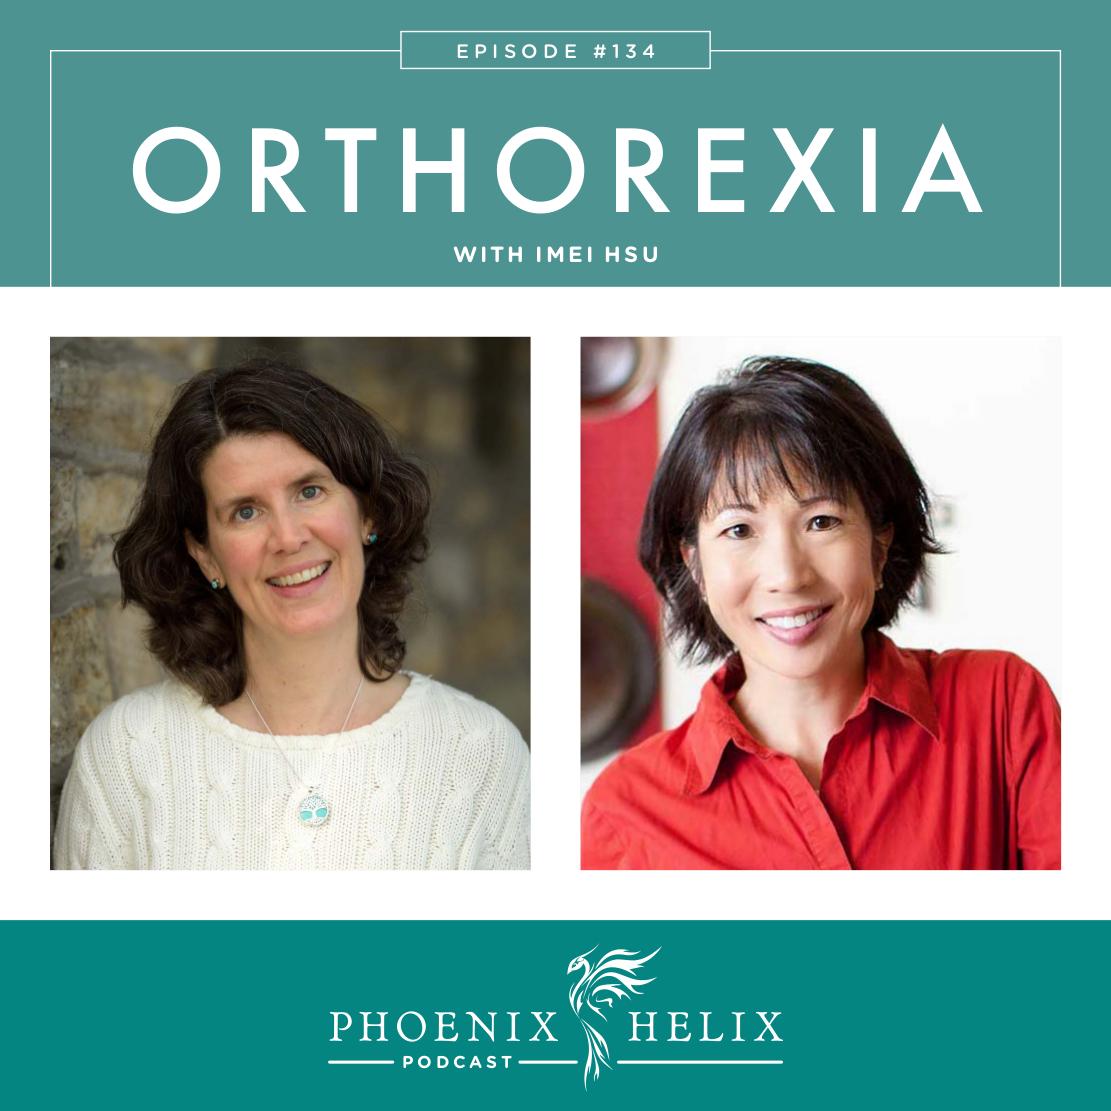 Orthorexia with Imei Hsu | Phoenix Helix Podcast